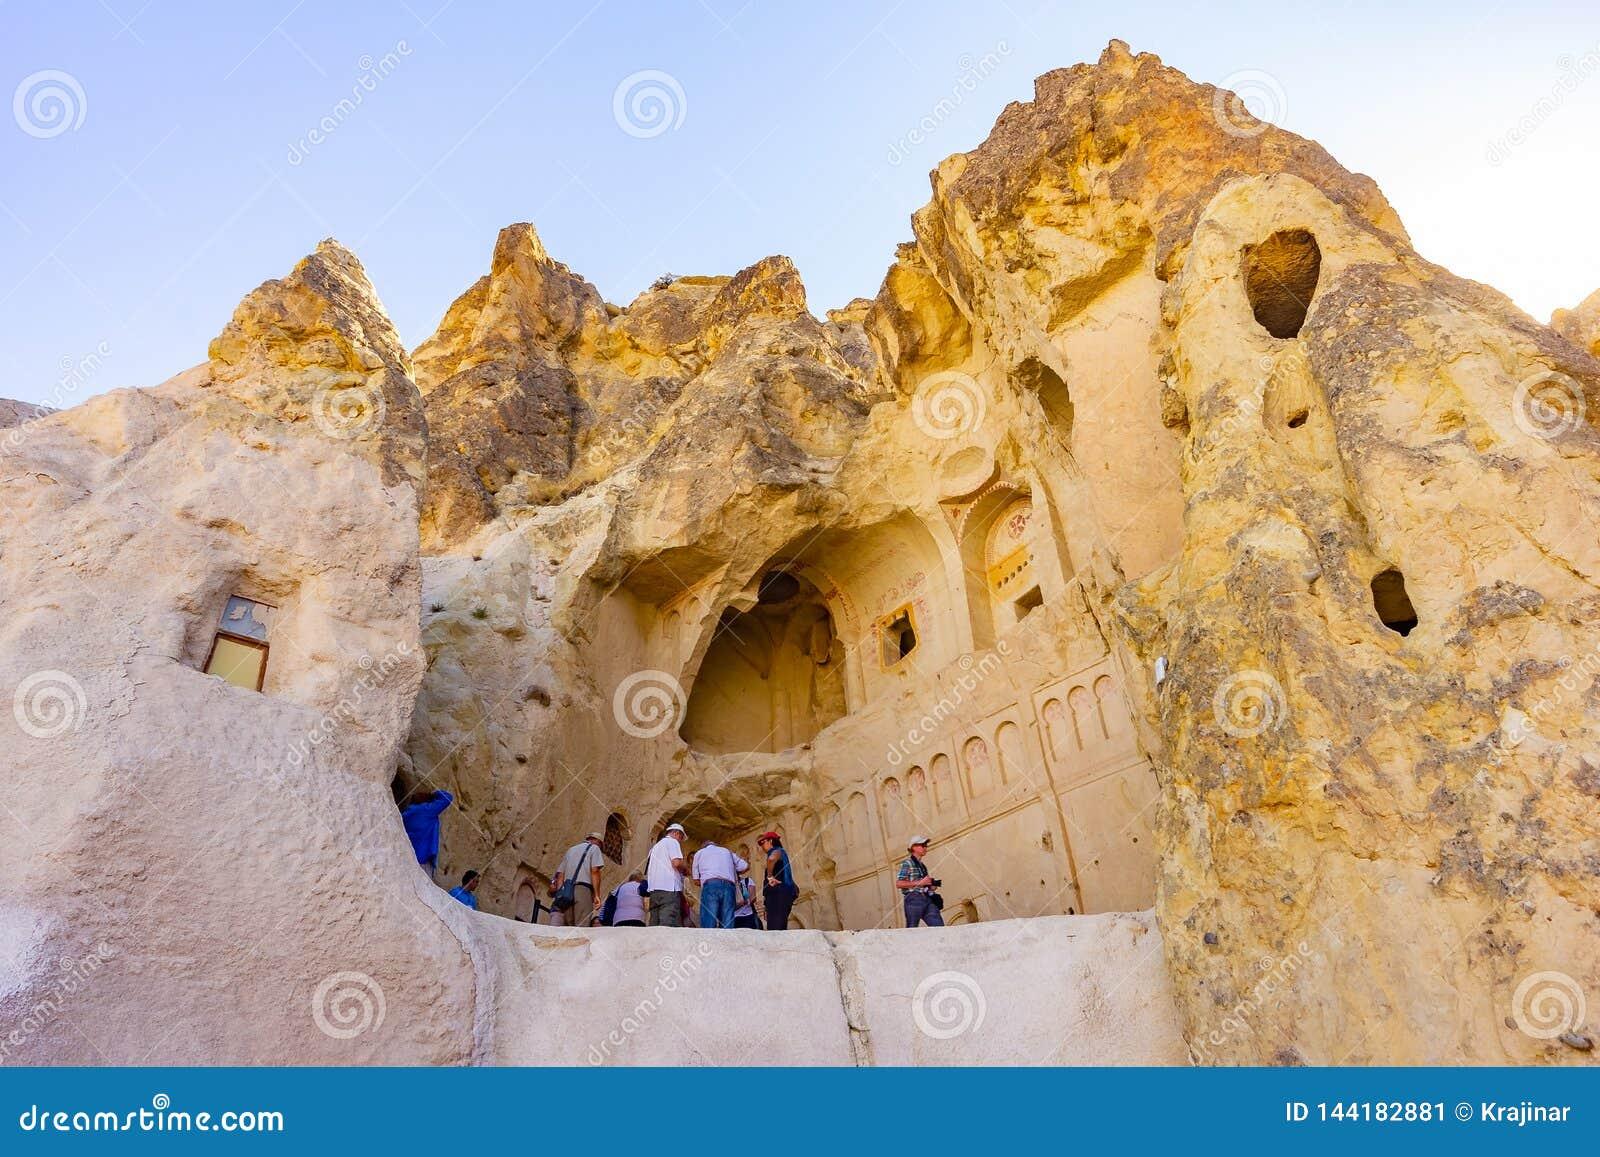 Cappadocia, Τουρκία, στις 13 Σεπτεμβρίου 2018: Τουρίστες που εξετάζουν την αρχαία εκκλησία, το μεγαλύτερο μοναστήρι βράχος-περικο